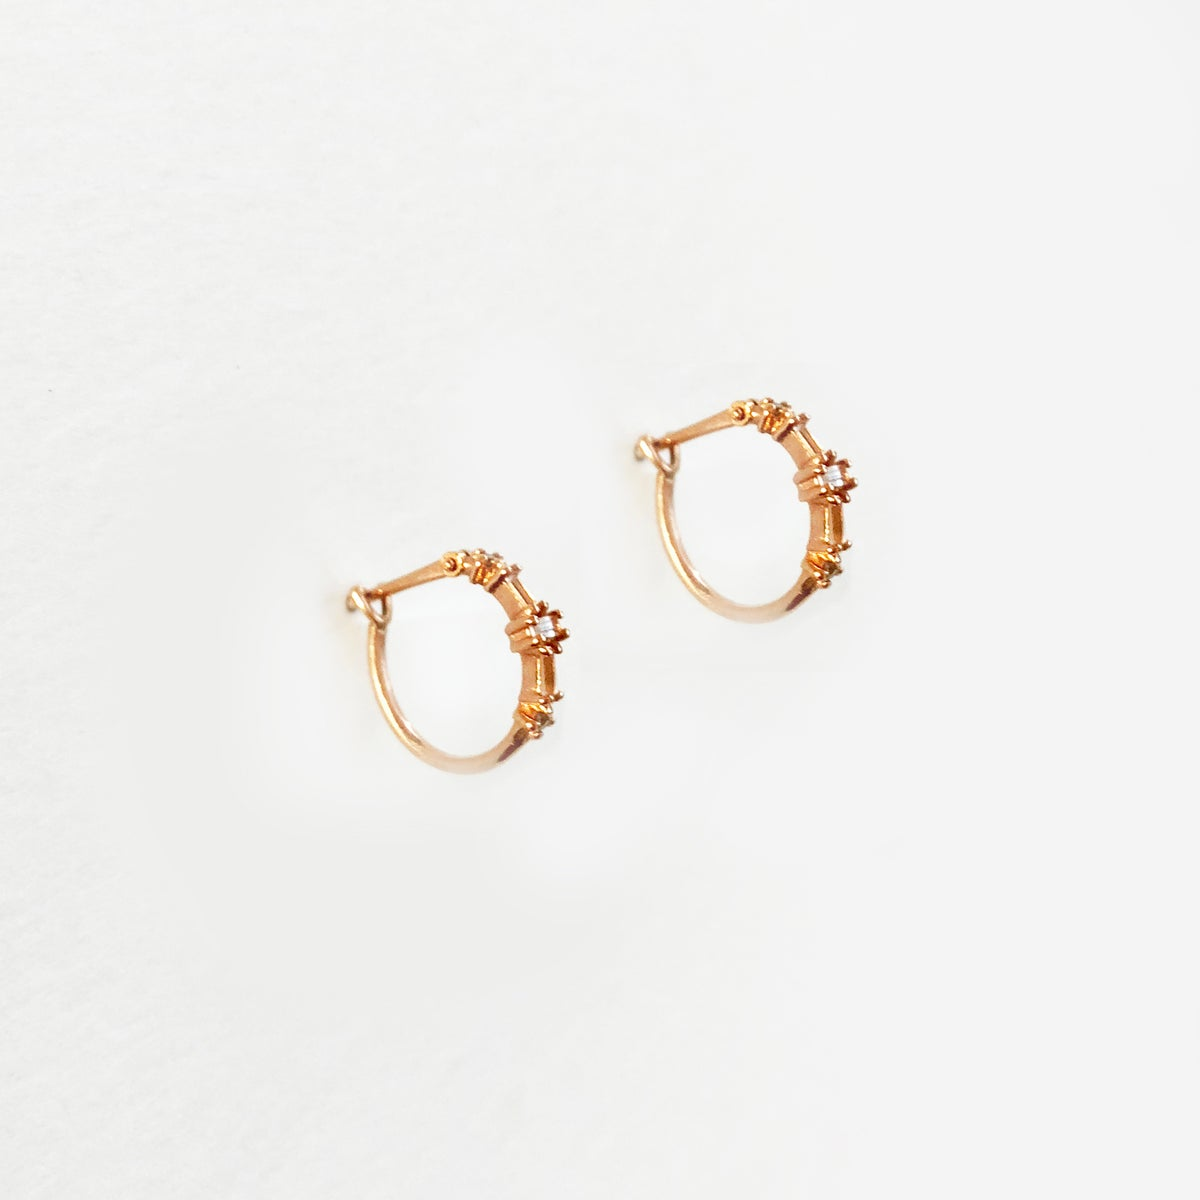 Image of Deco Mini Hoop Earring